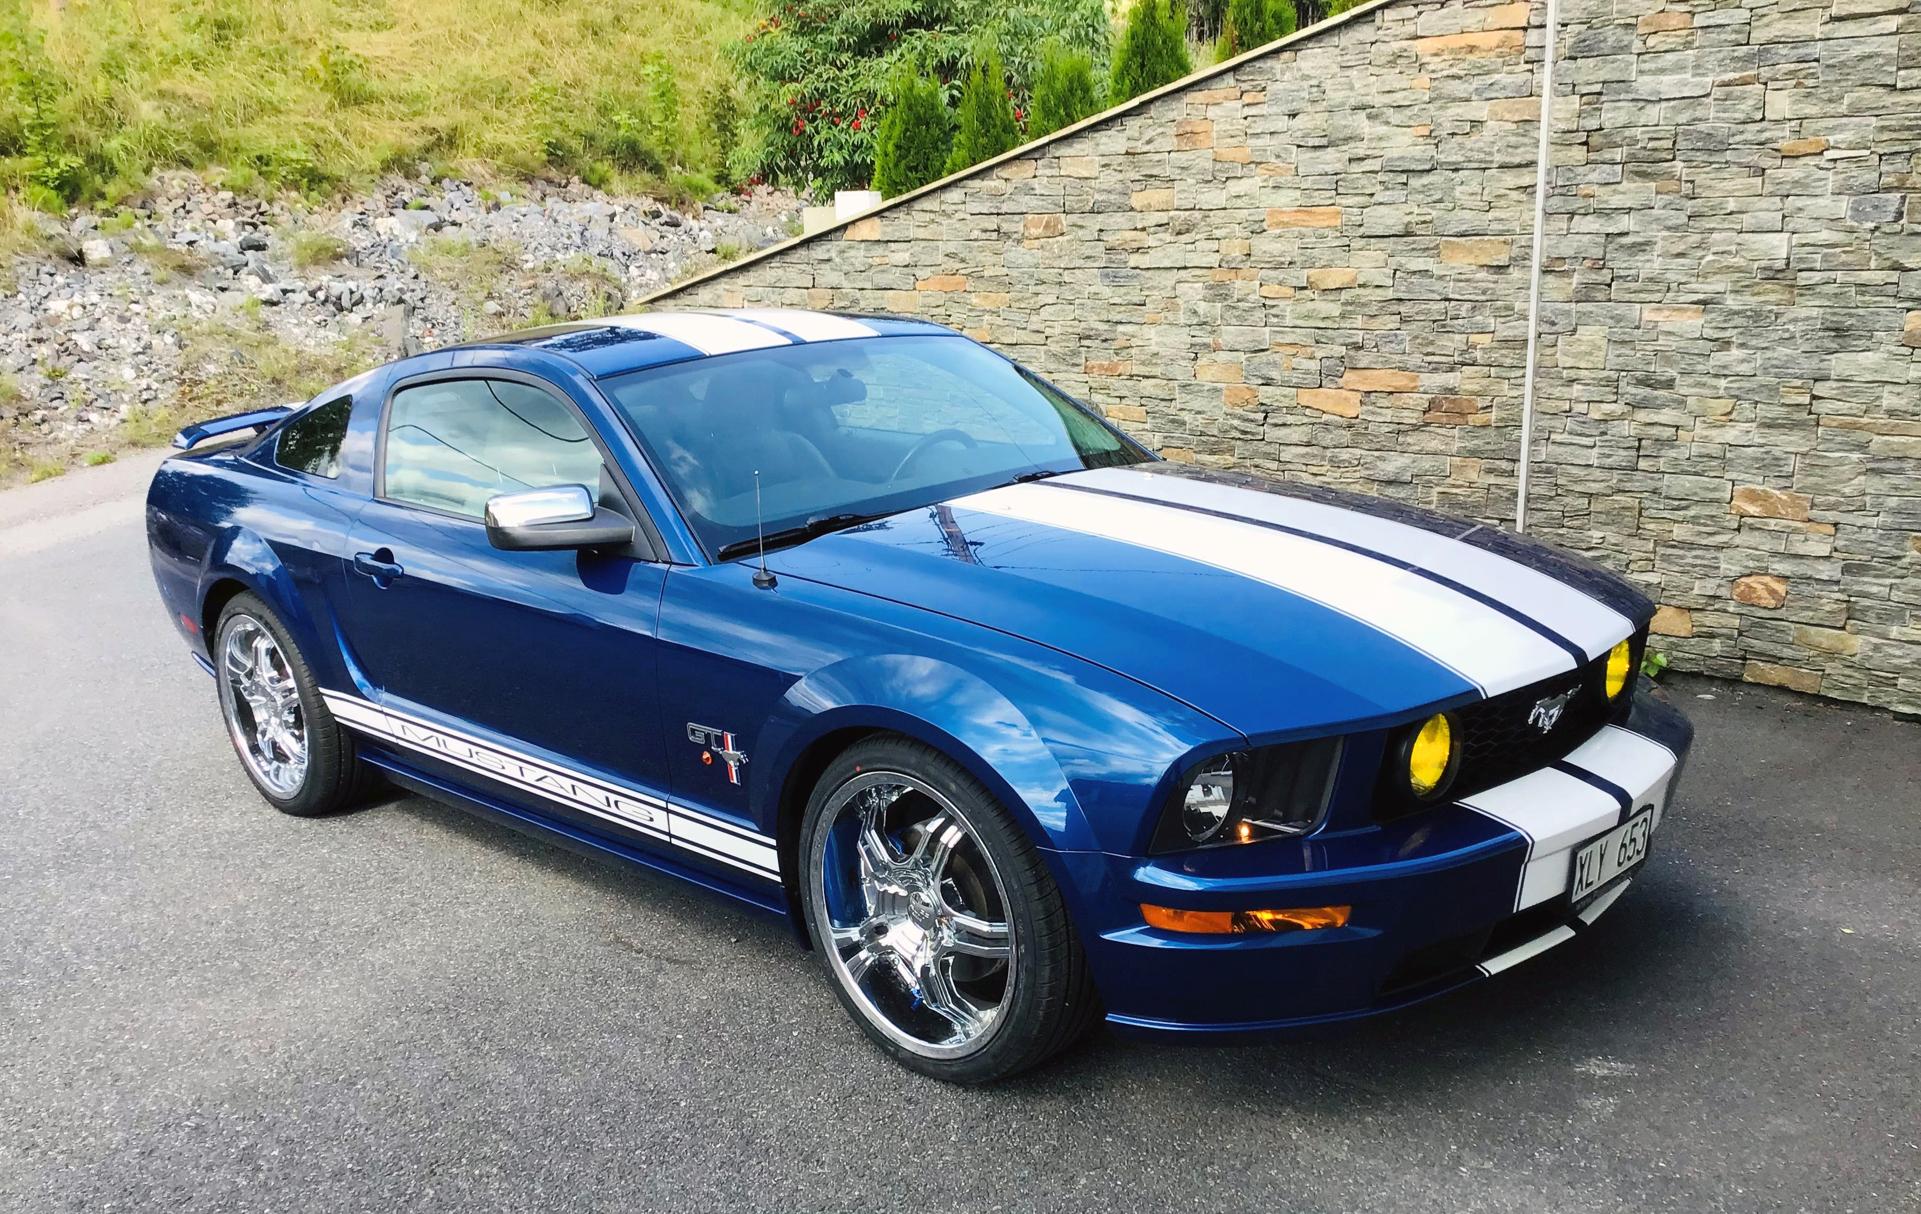 090-2007 Ford Mustang GT 01. Eier- medlem 090 Robe